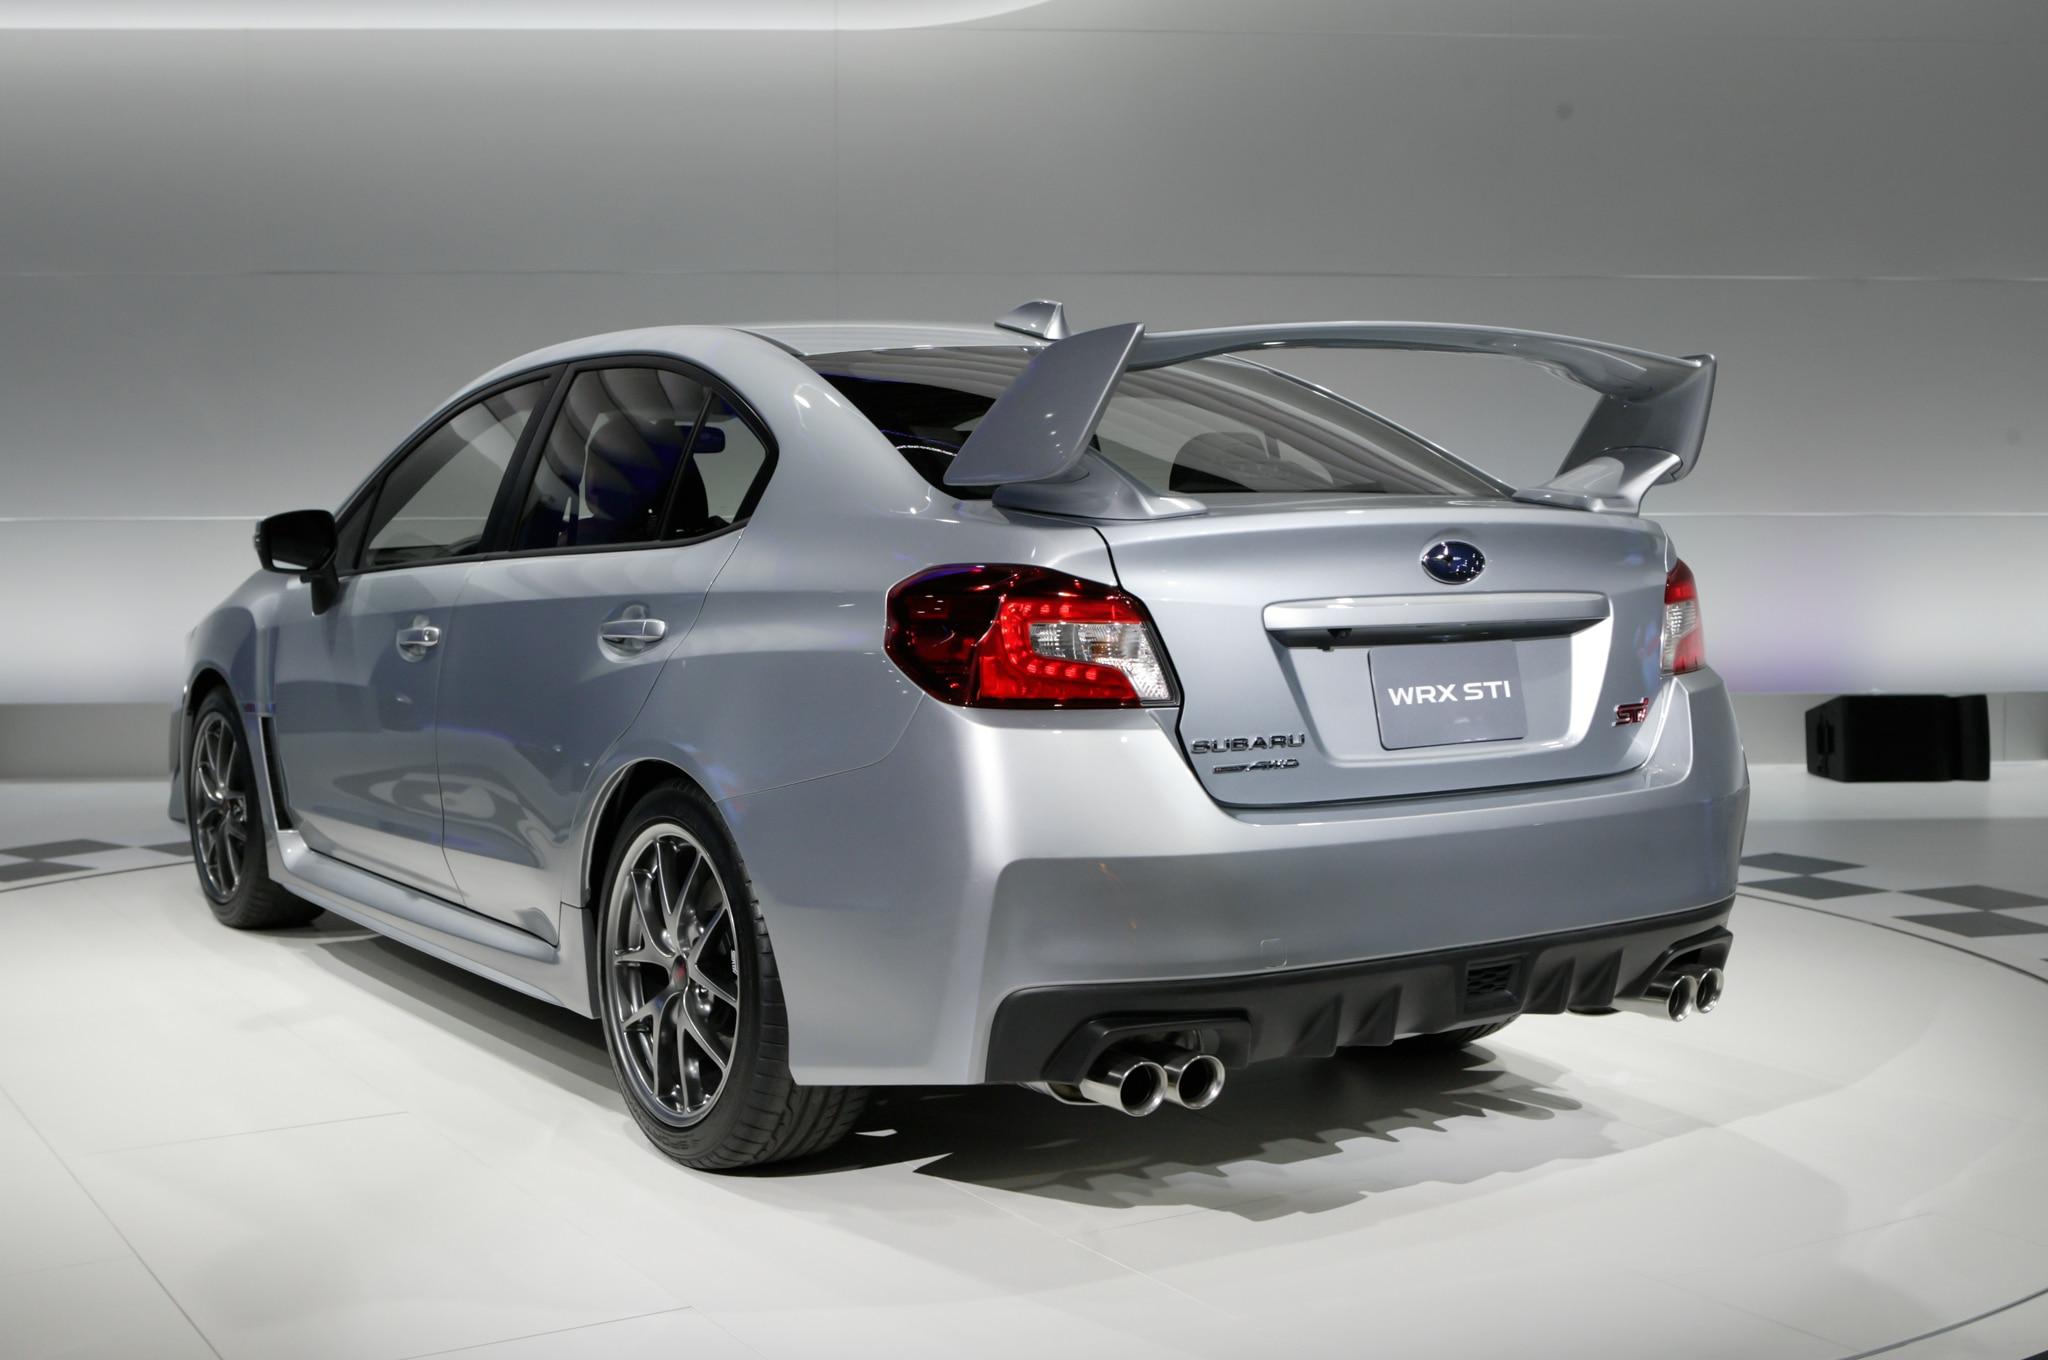 Detroit 2014 2015 Subaru WRX STI Continues Its GoFast Legacy